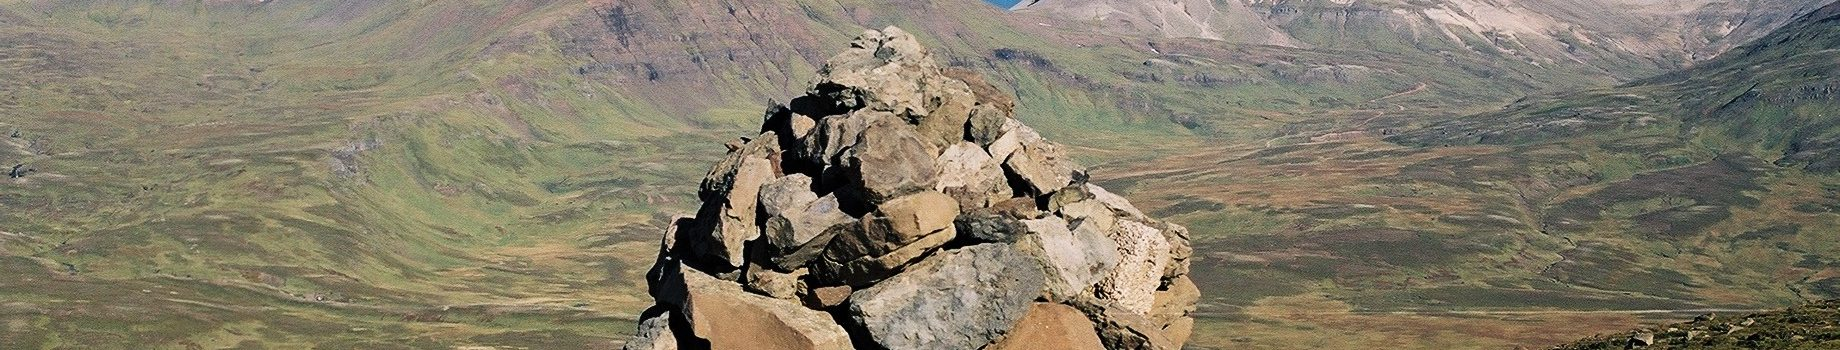 Hiking-East-Fjords-Iceland